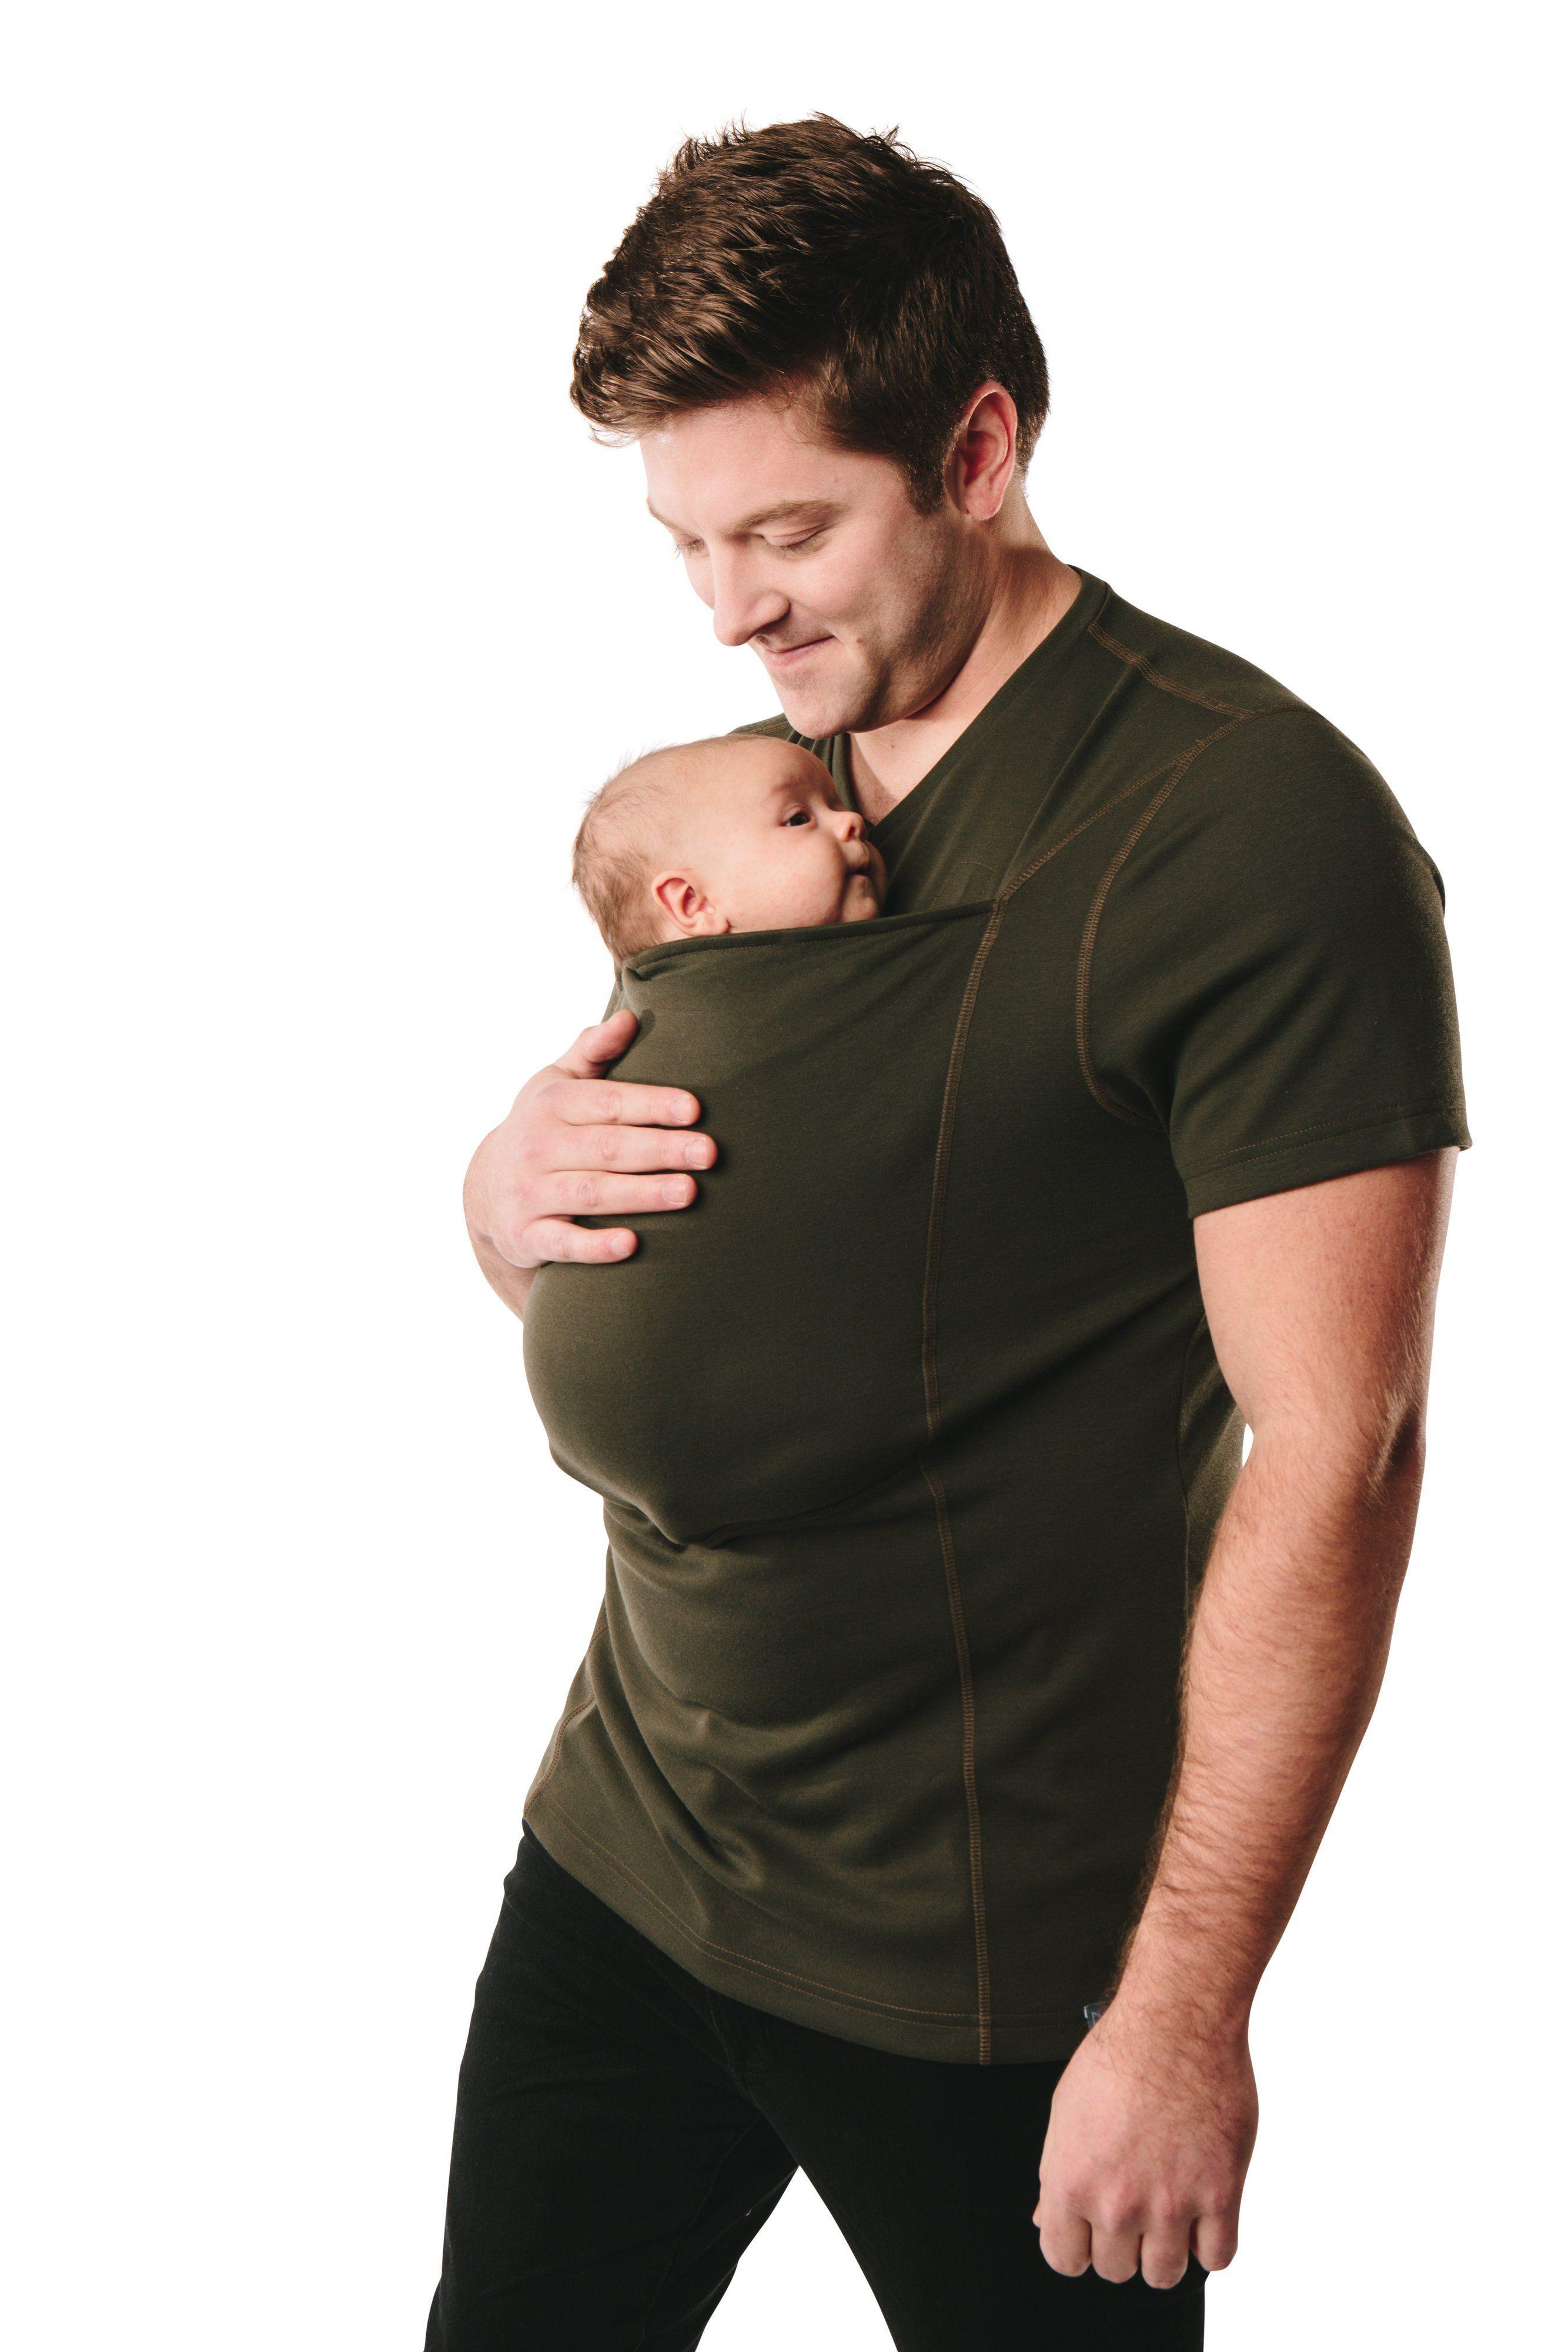 179f7773a50 Multifunctional Women Baby Carrier Kangaroo Soothe T Shirts Men Daddy Baby  T Shirt. Dad Babywearing Shirt - Project Nursery